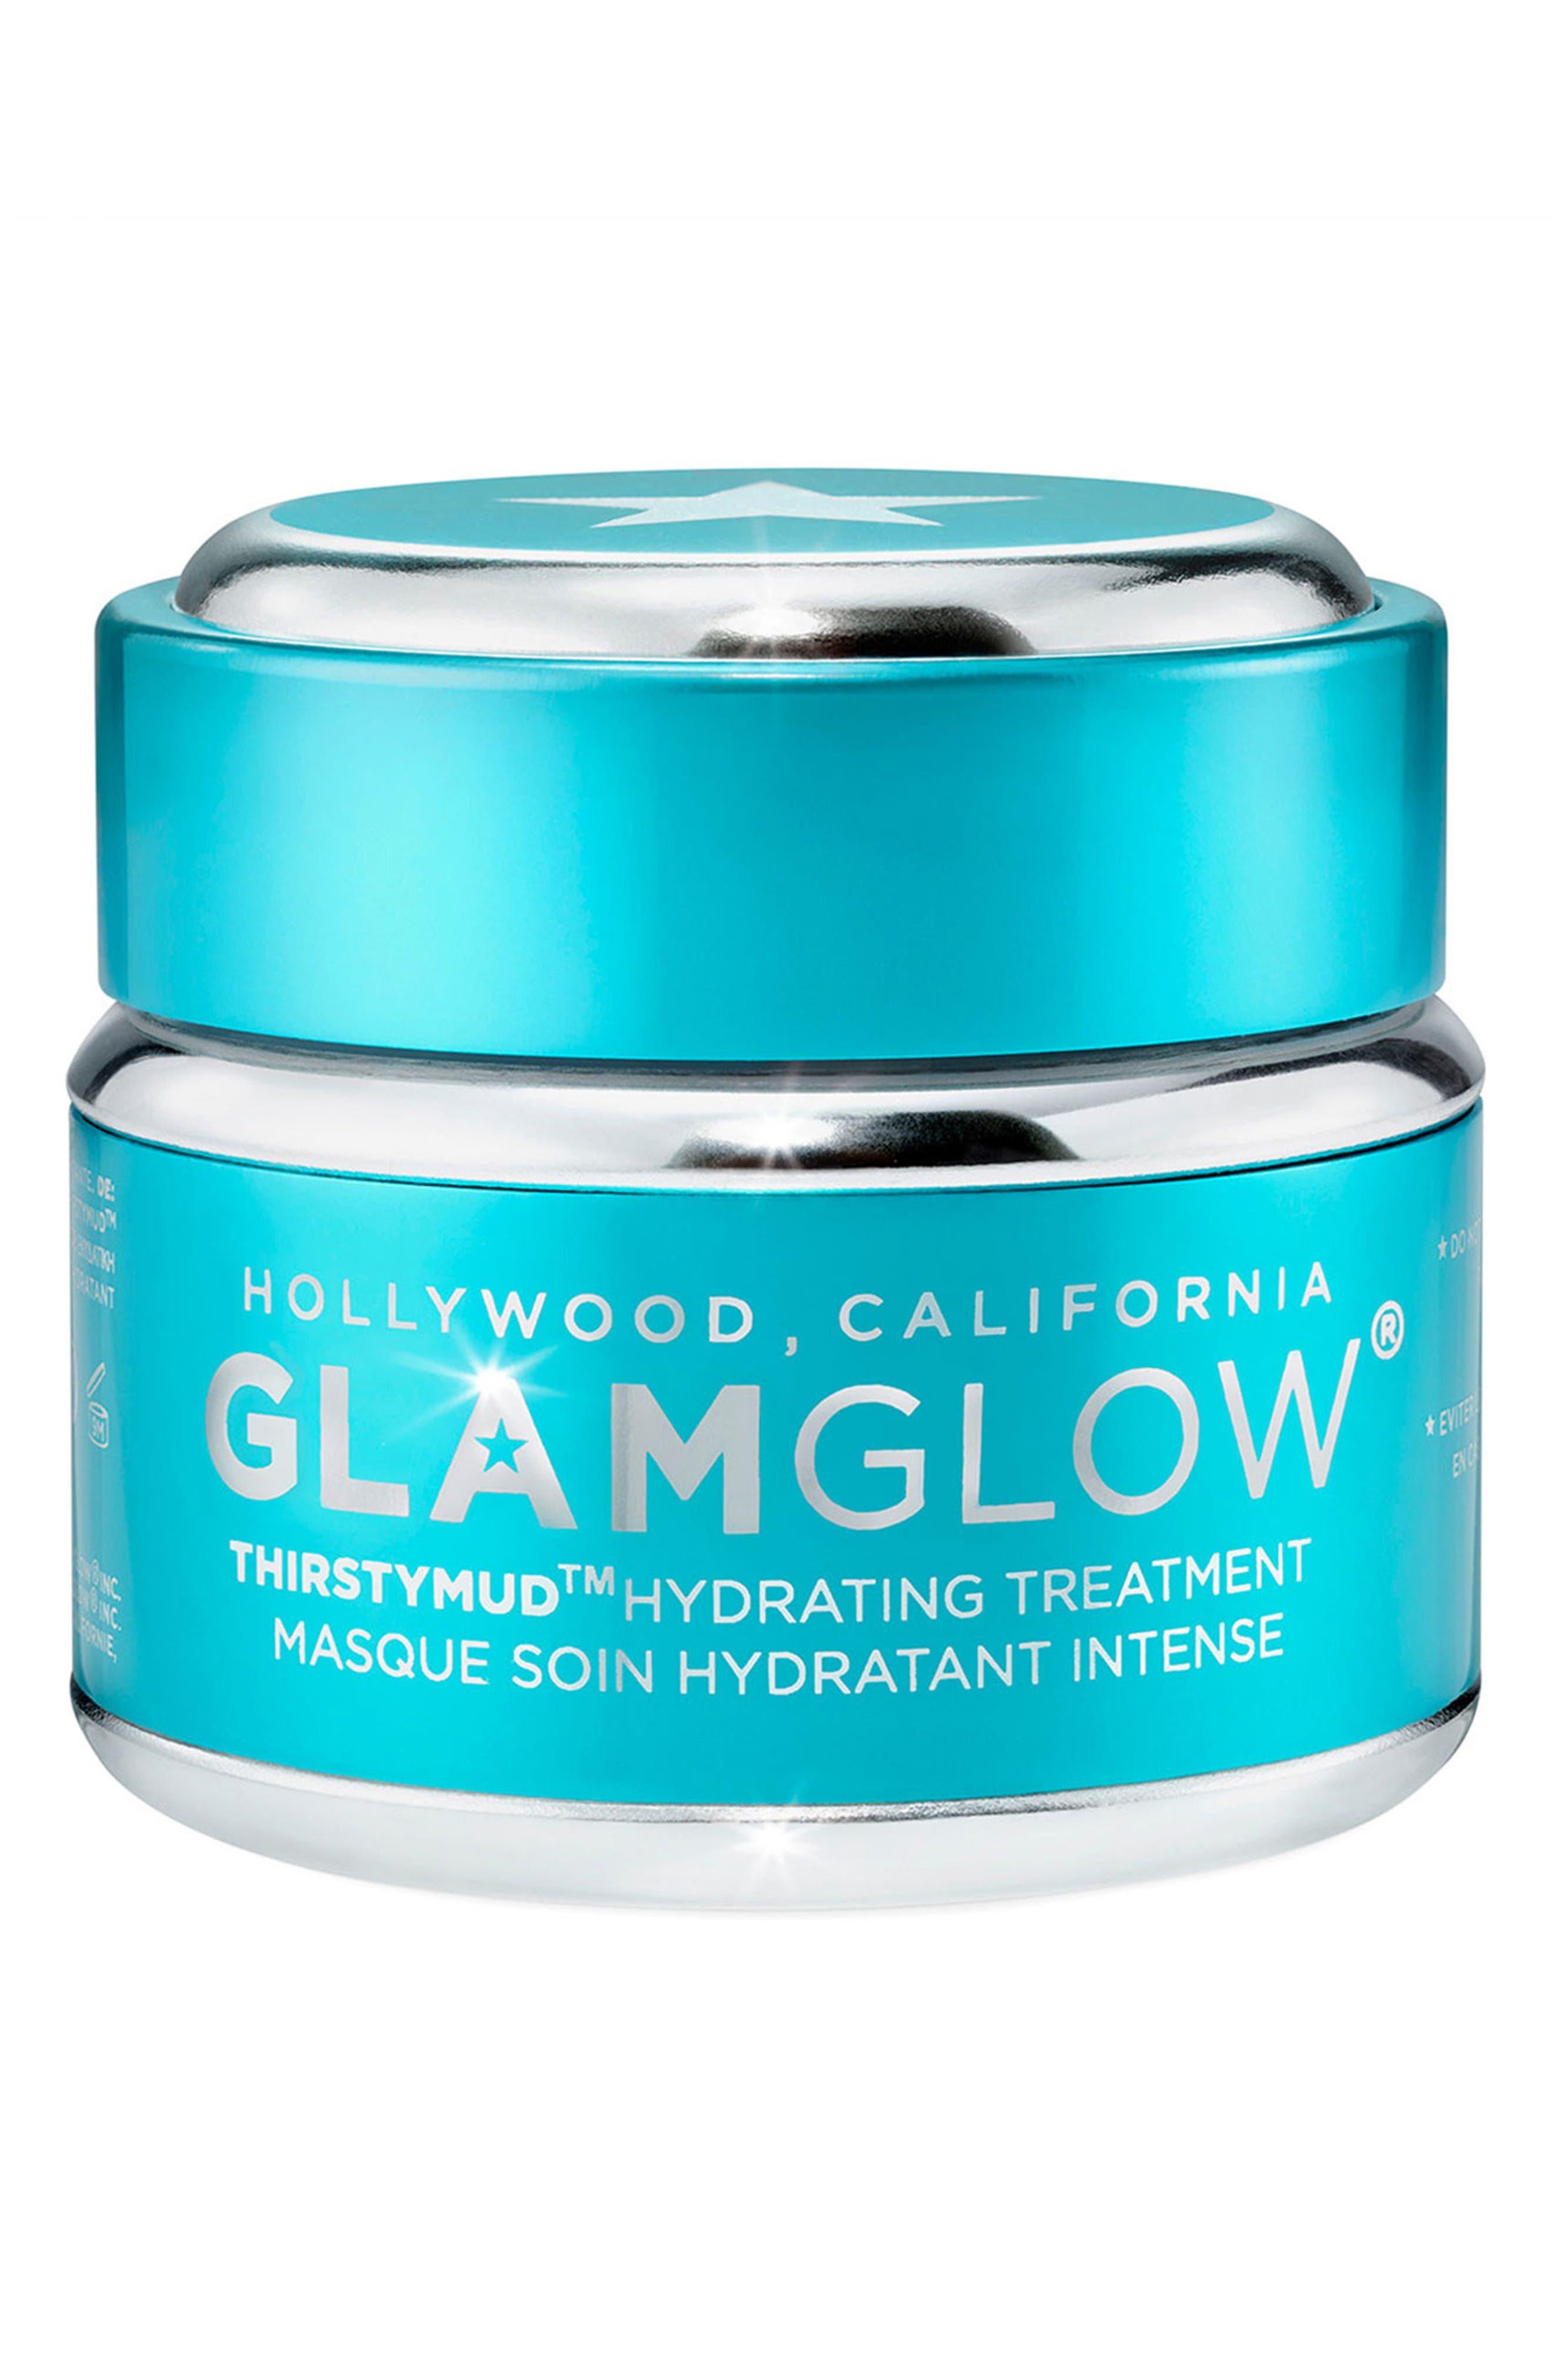 Glamglow Thirstymud(TM) Hydrating Treatment Mask